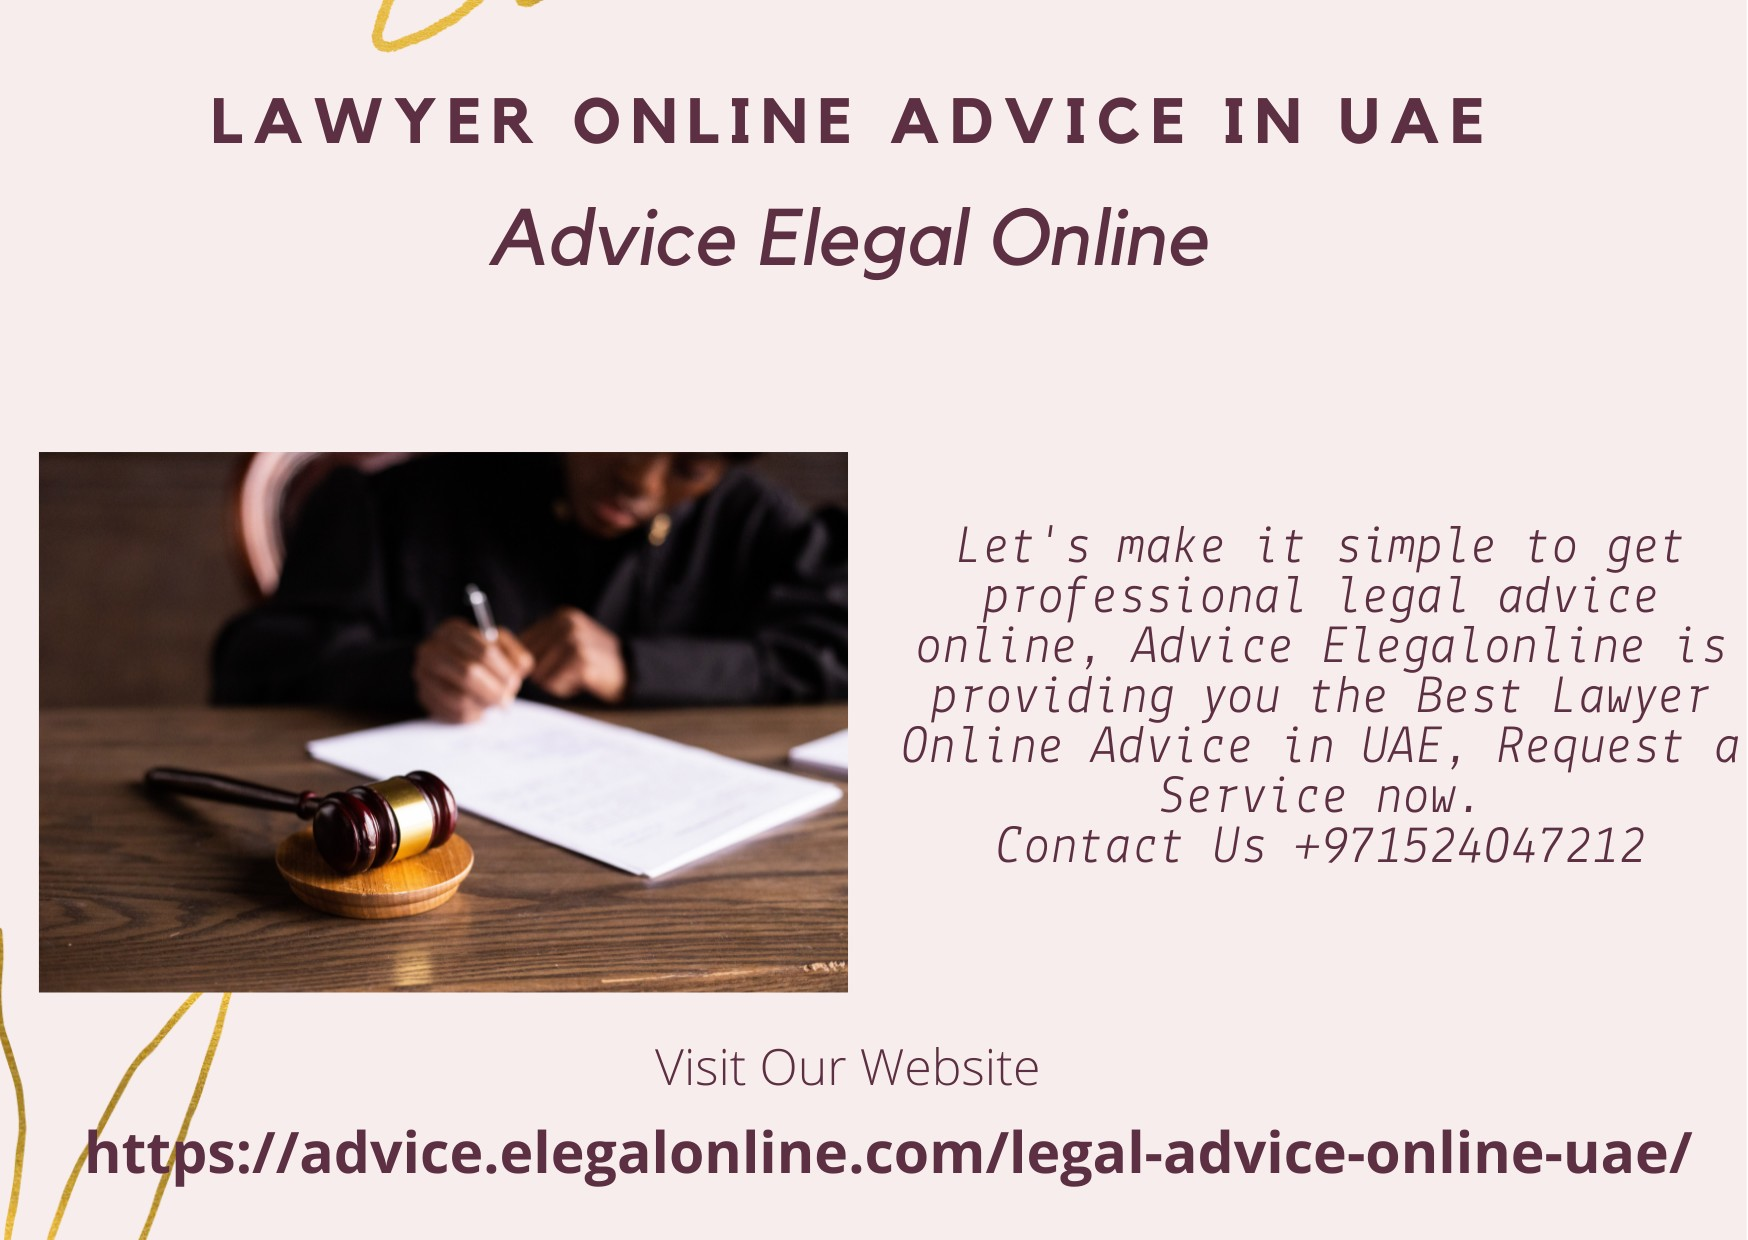 Lawyer Online Advice in UAE | Advice Elegalonline - UAE